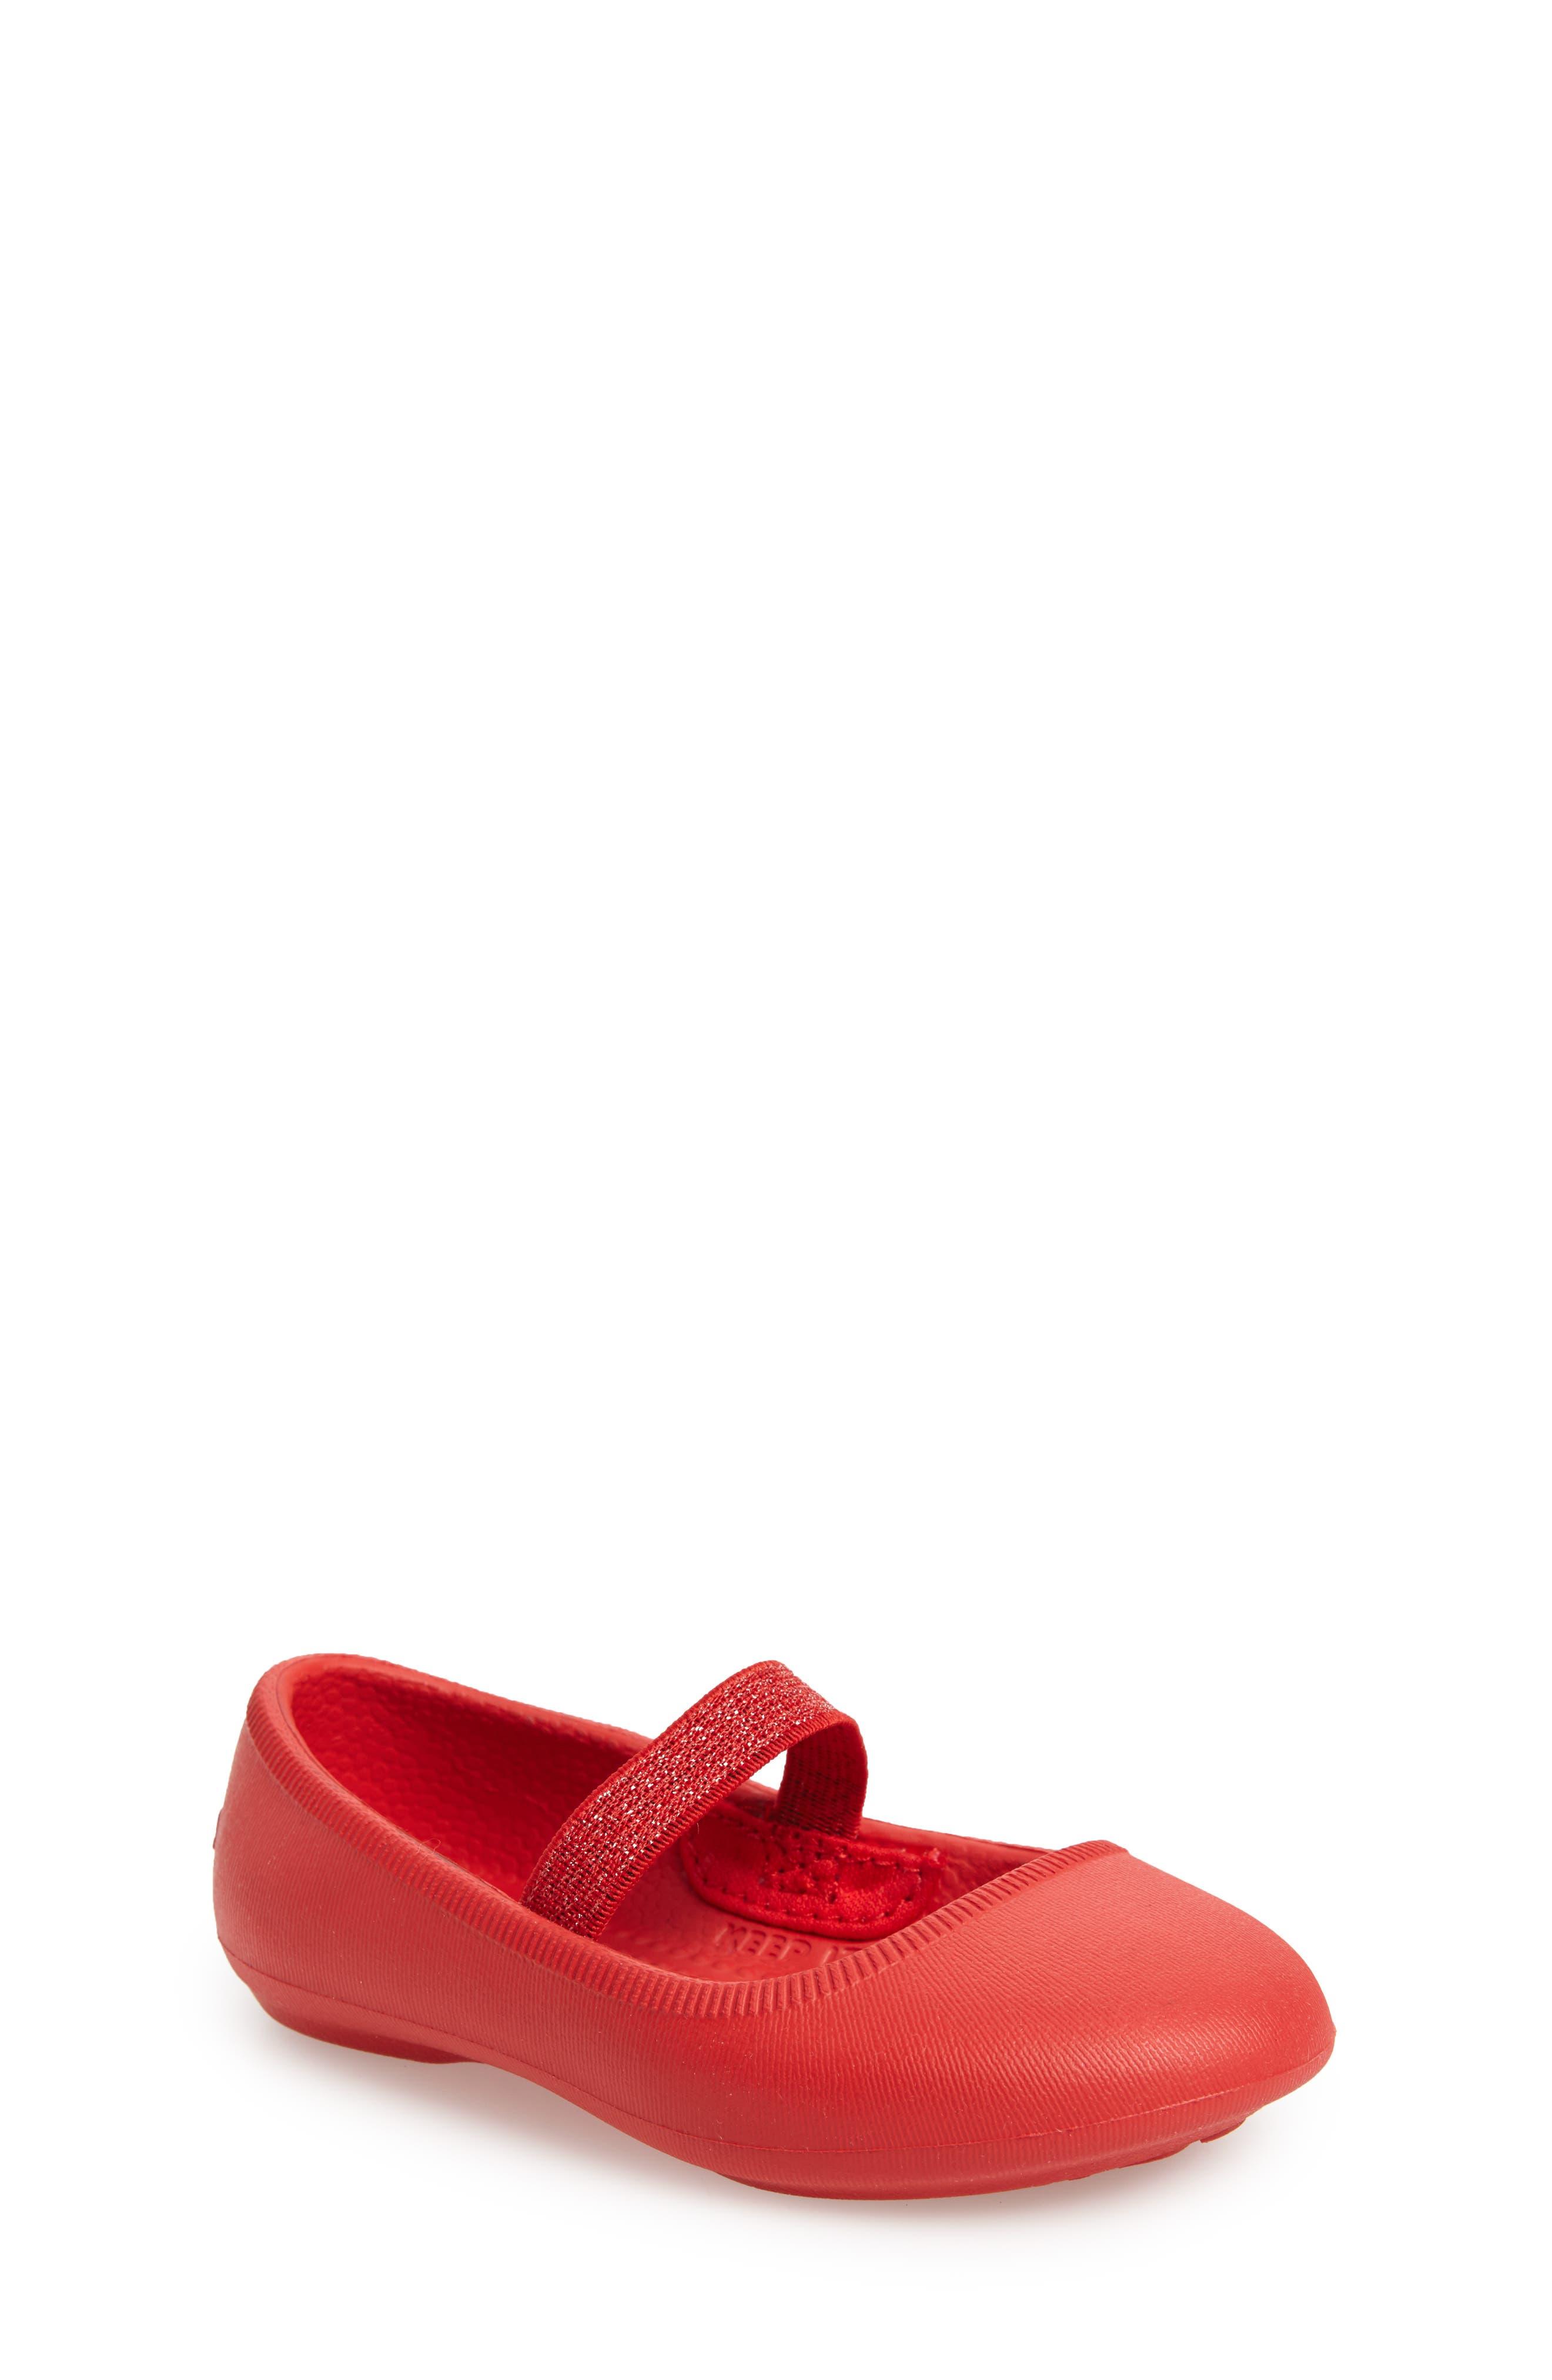 Native Shoes Margot Mary Jane Flat (Baby, Walker, Toddler, Little Kid & Big Kid)